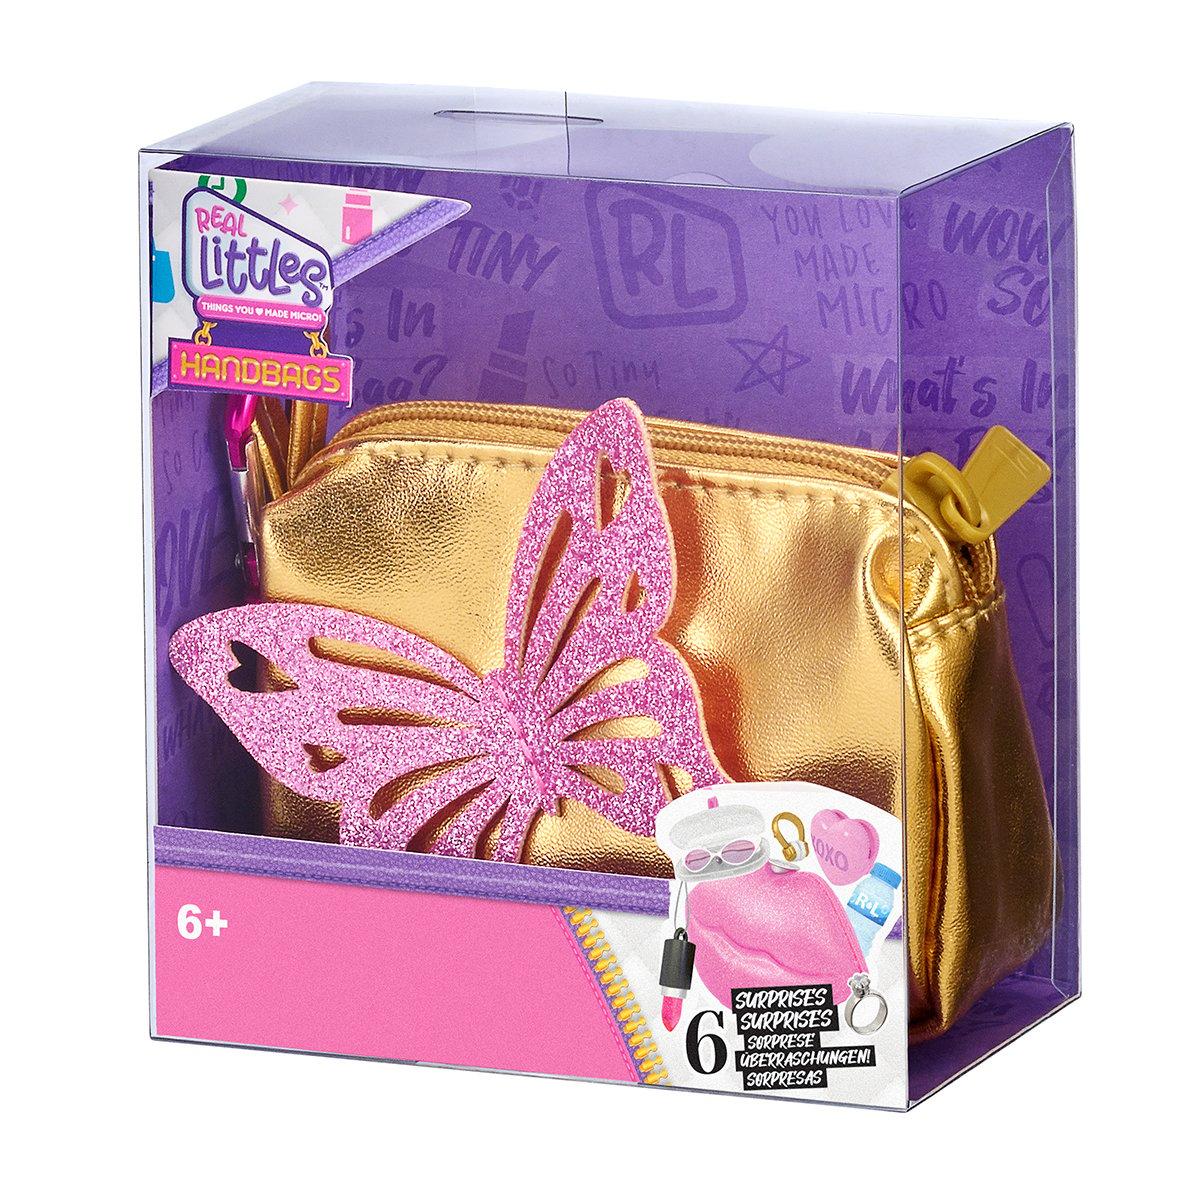 Mini gentuta de mana cu 6 surprize, Real Littles, Handbag, S3, Auriu